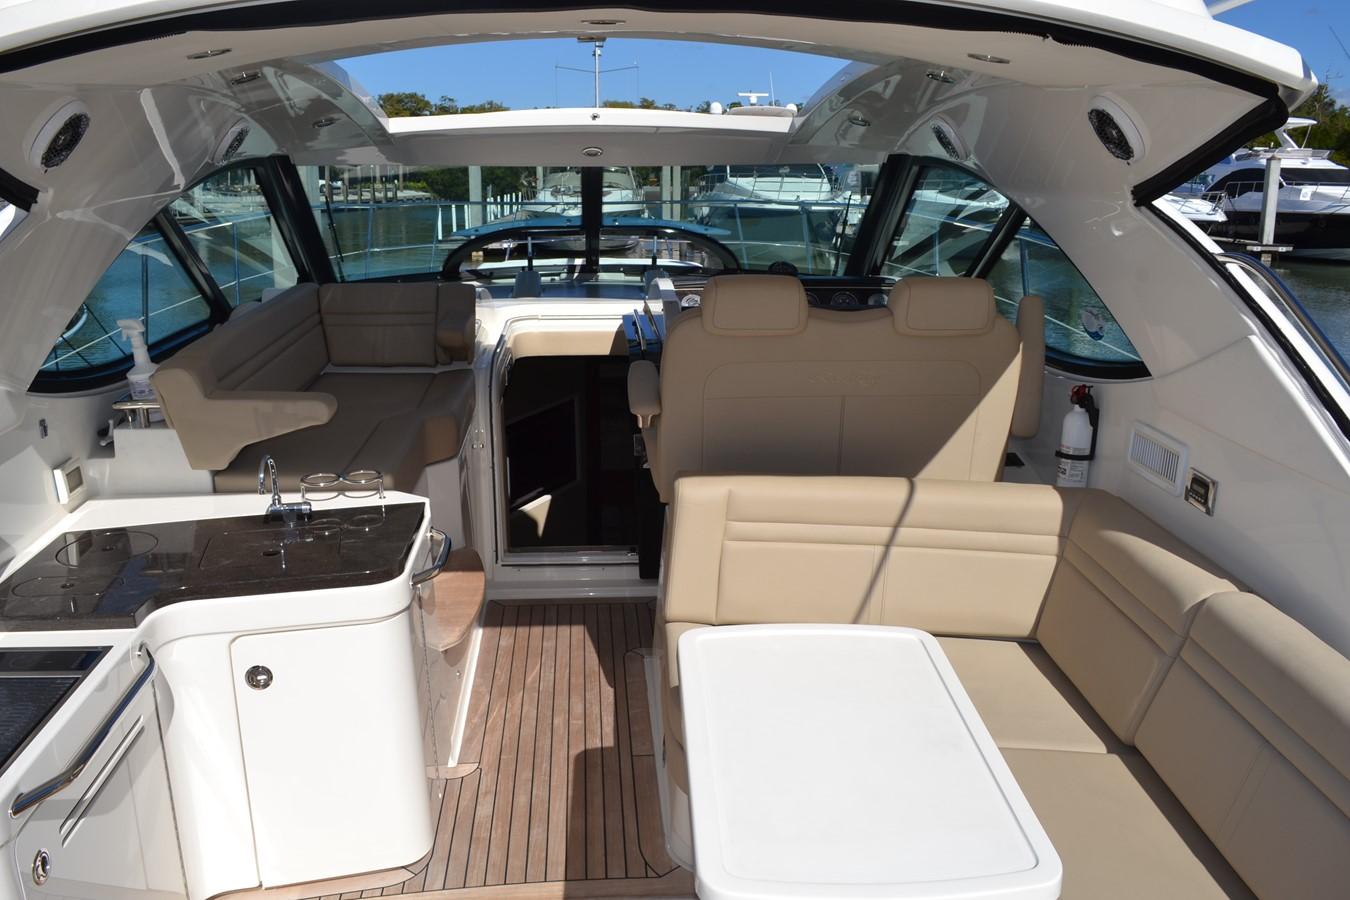 Aft cockpit Settee Looking Forward 2015 SEA RAY 410 Sundancer Motor Yacht 1685729